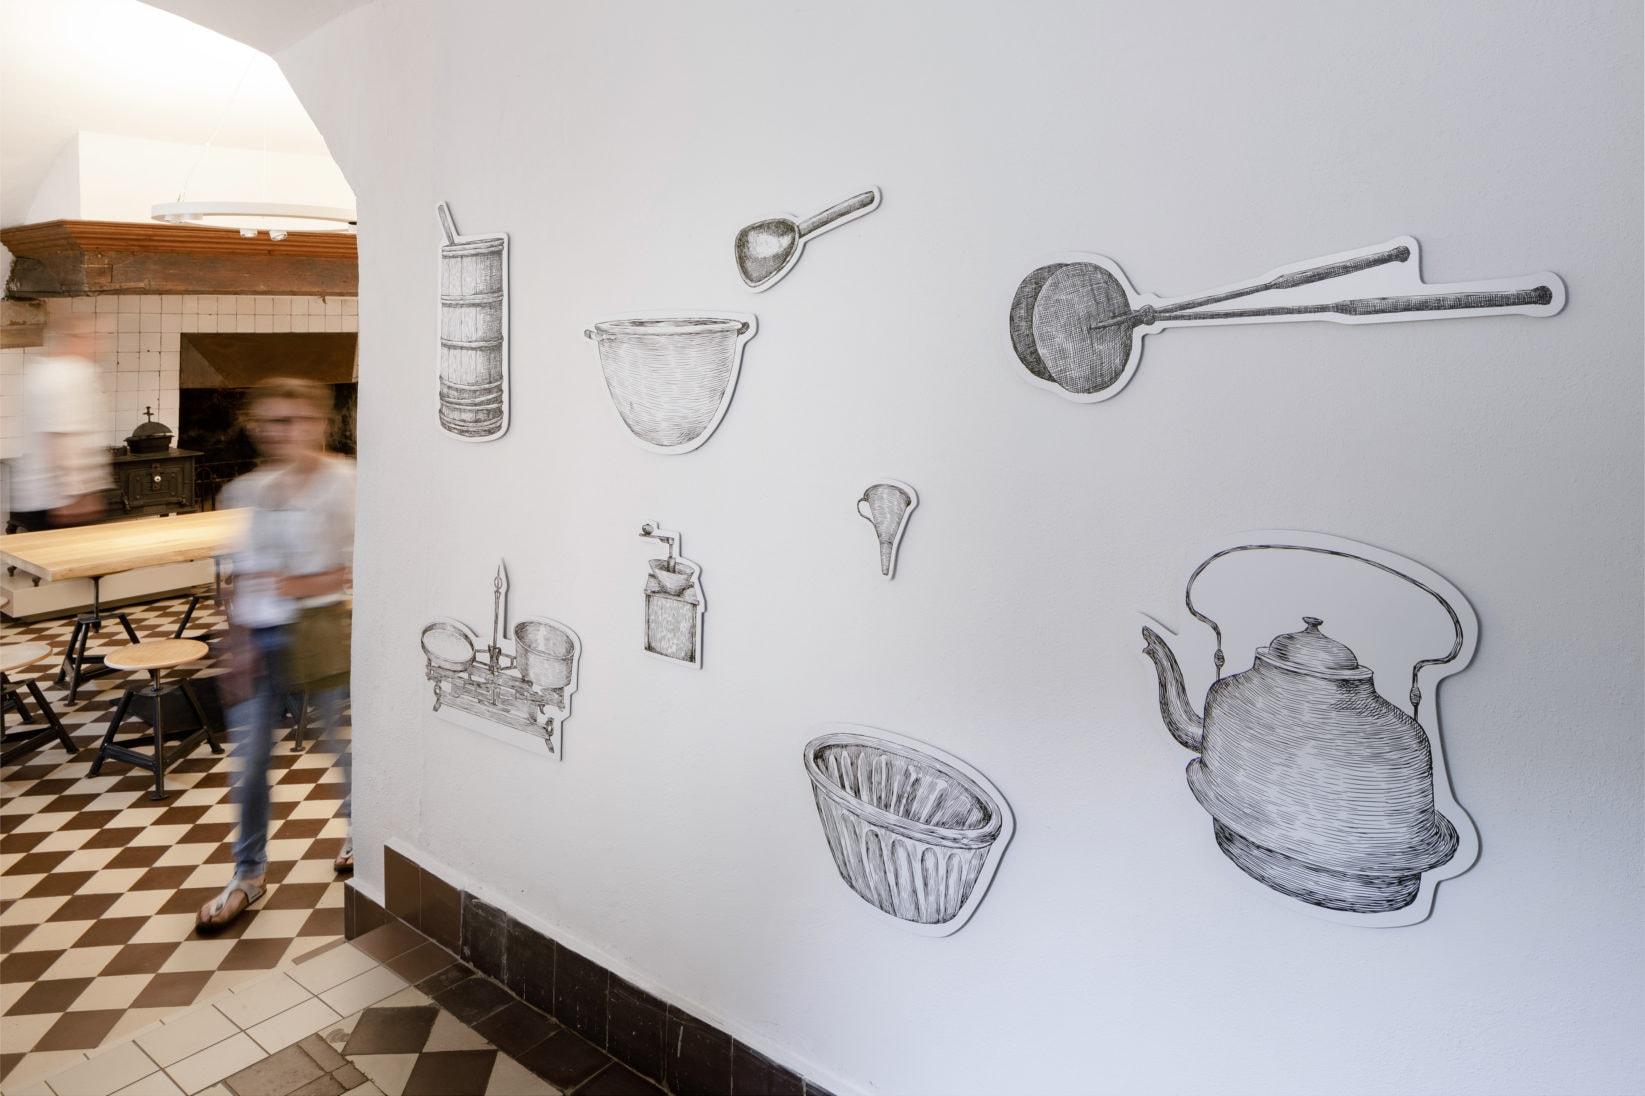 Ausstellung BurgVischering Ausstellungsgrafik Illustration Wandgrafik